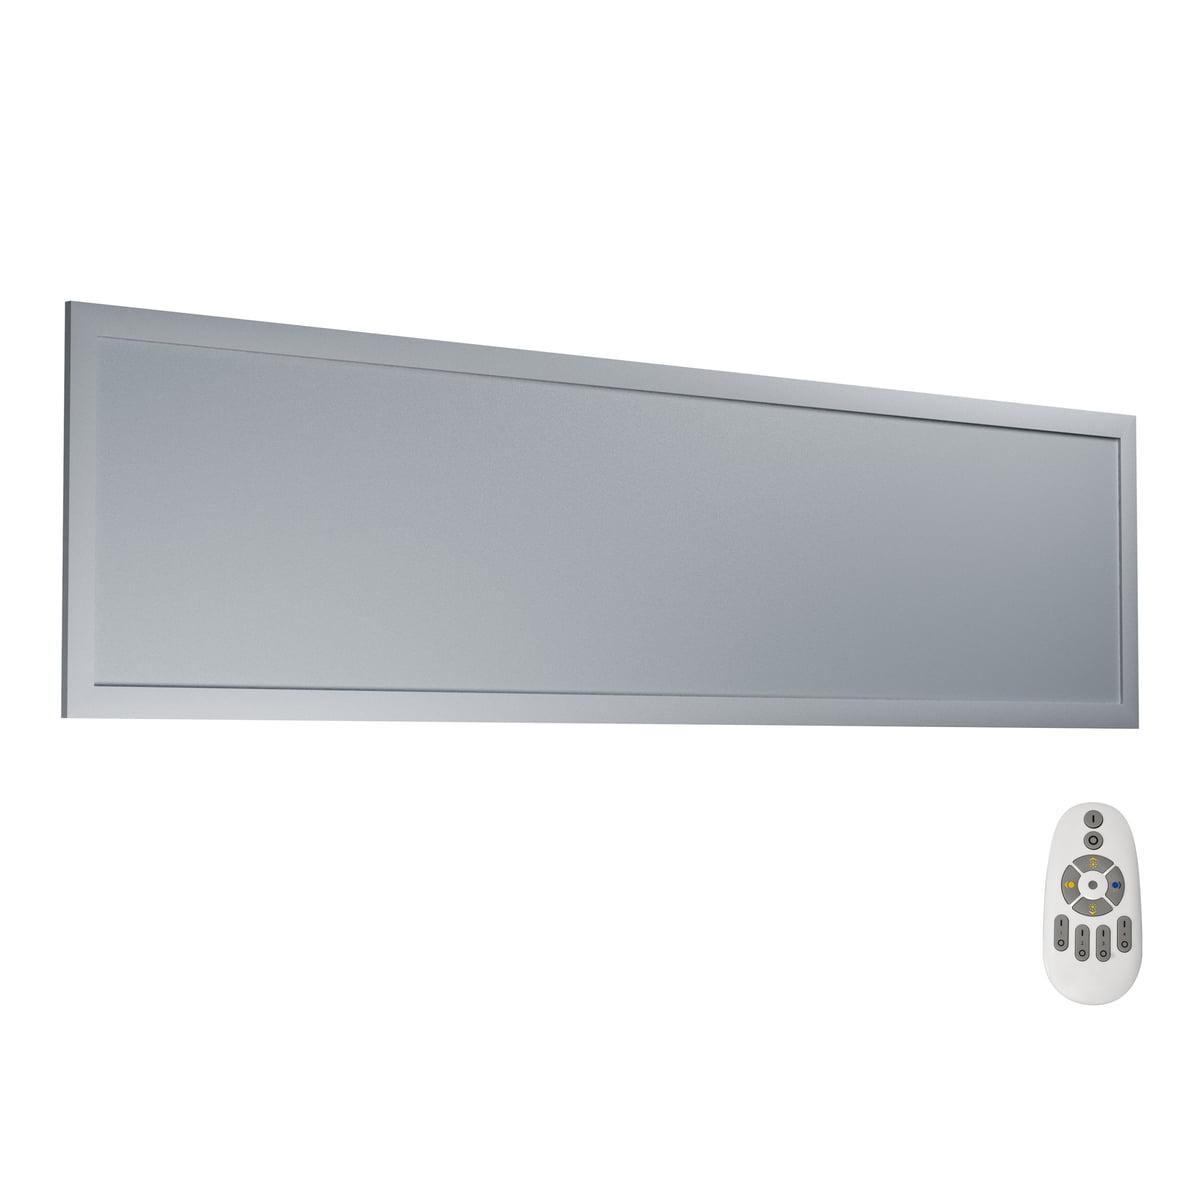 LED-Panel Planon Plus, 30 W / 2800 lm, 120 x 30 cm, dimmbar von Osram in Weiß